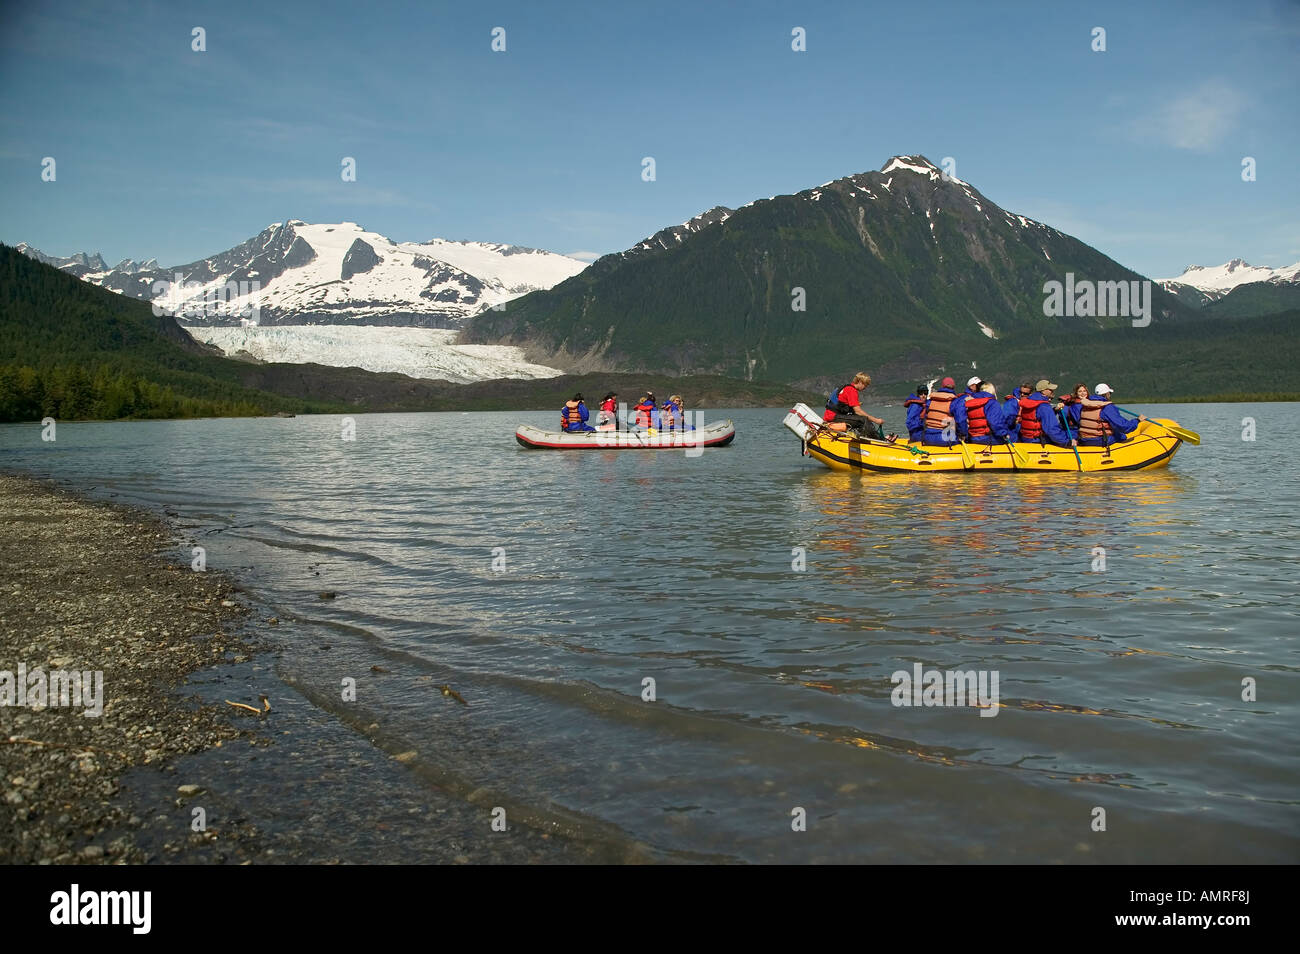 USA, Alaska, Inside Passage, Juneau, Mendenhall Lake, Rafting - Stock Image